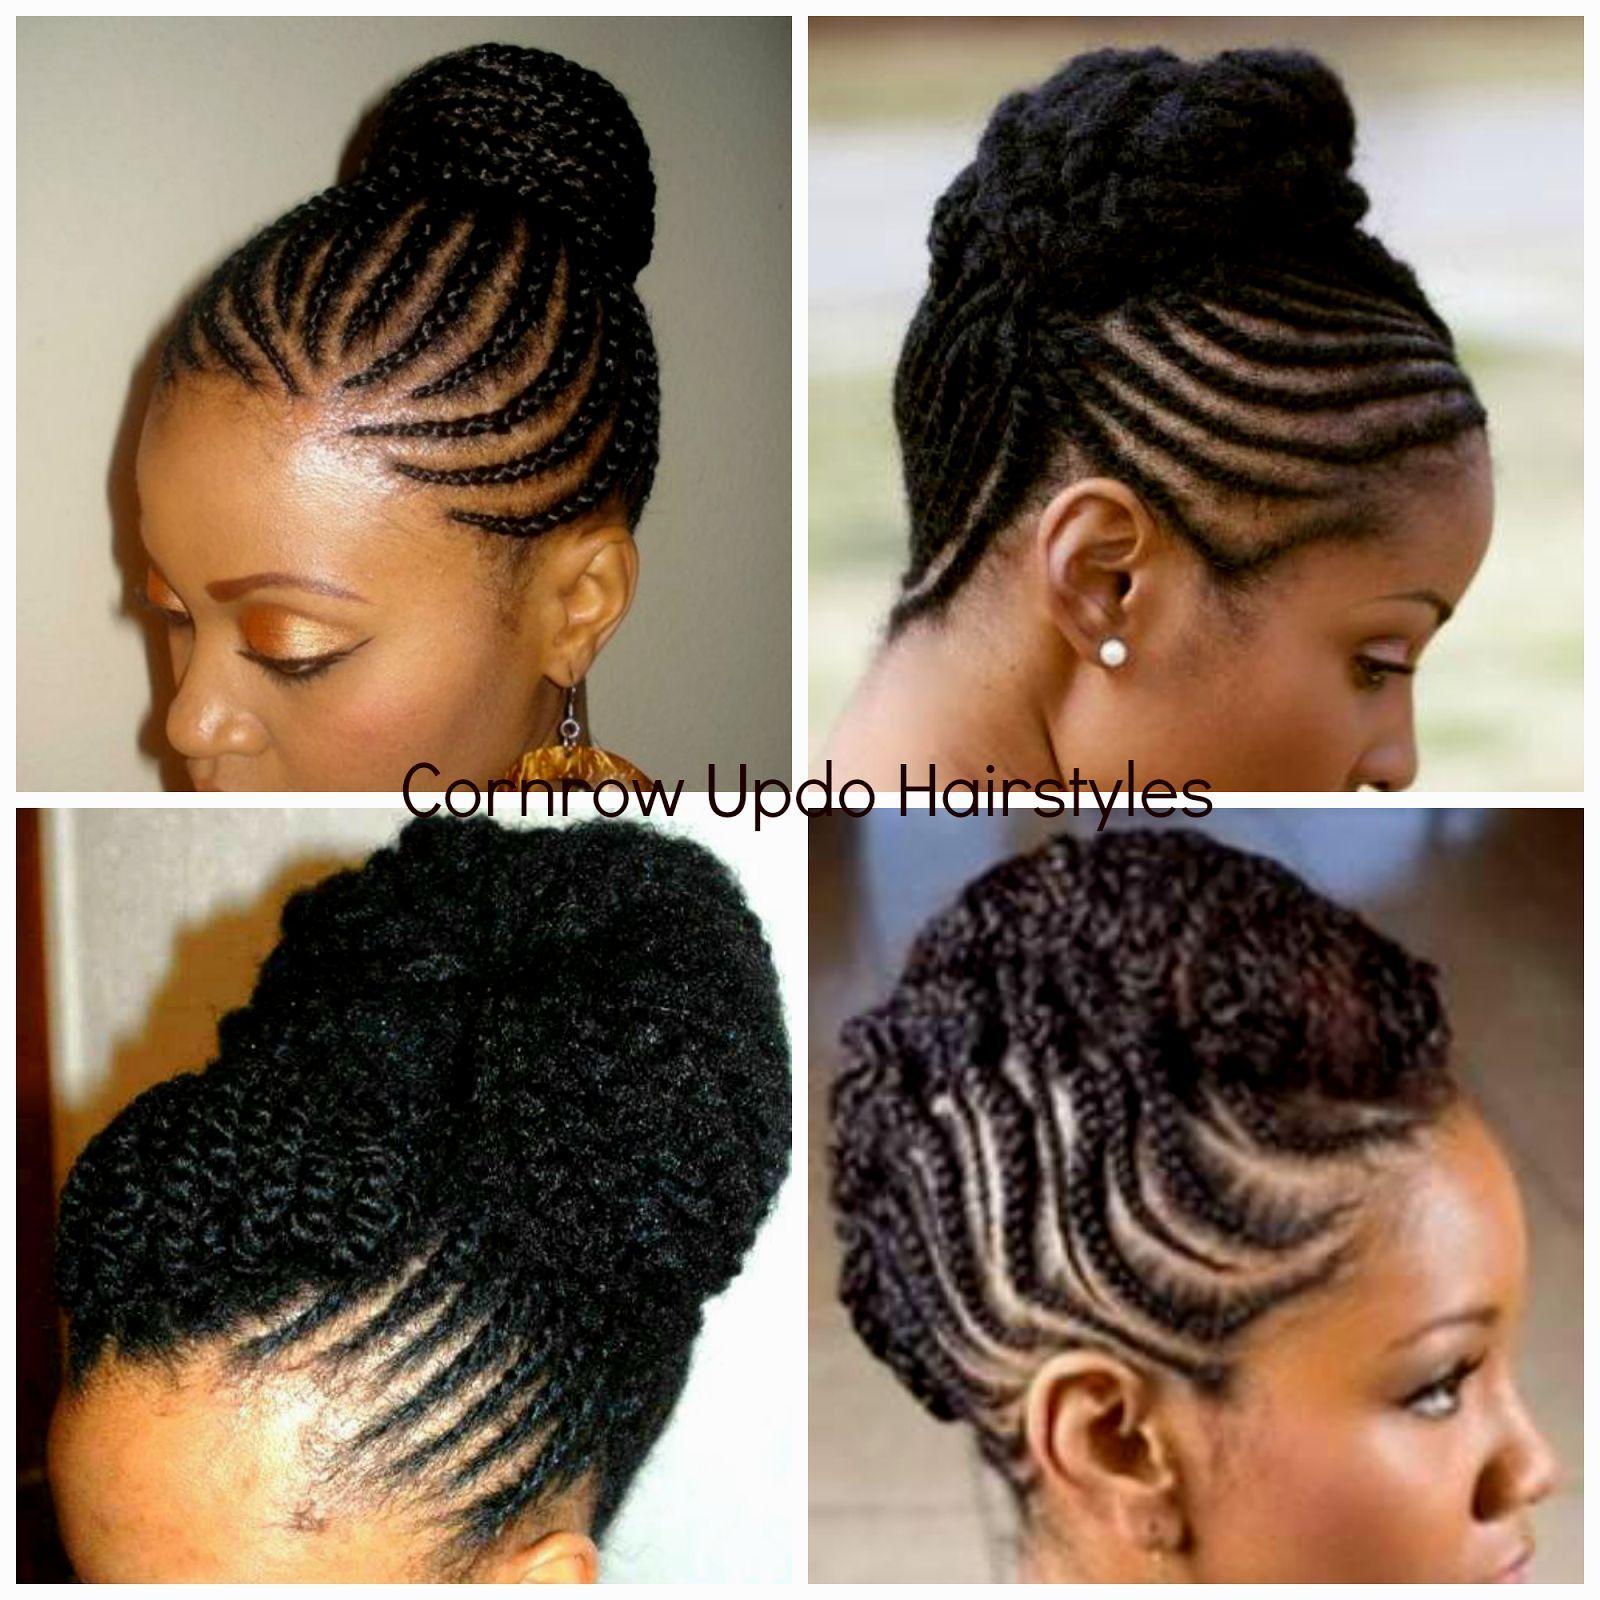 Cornrow Updo Hairstyles 2016